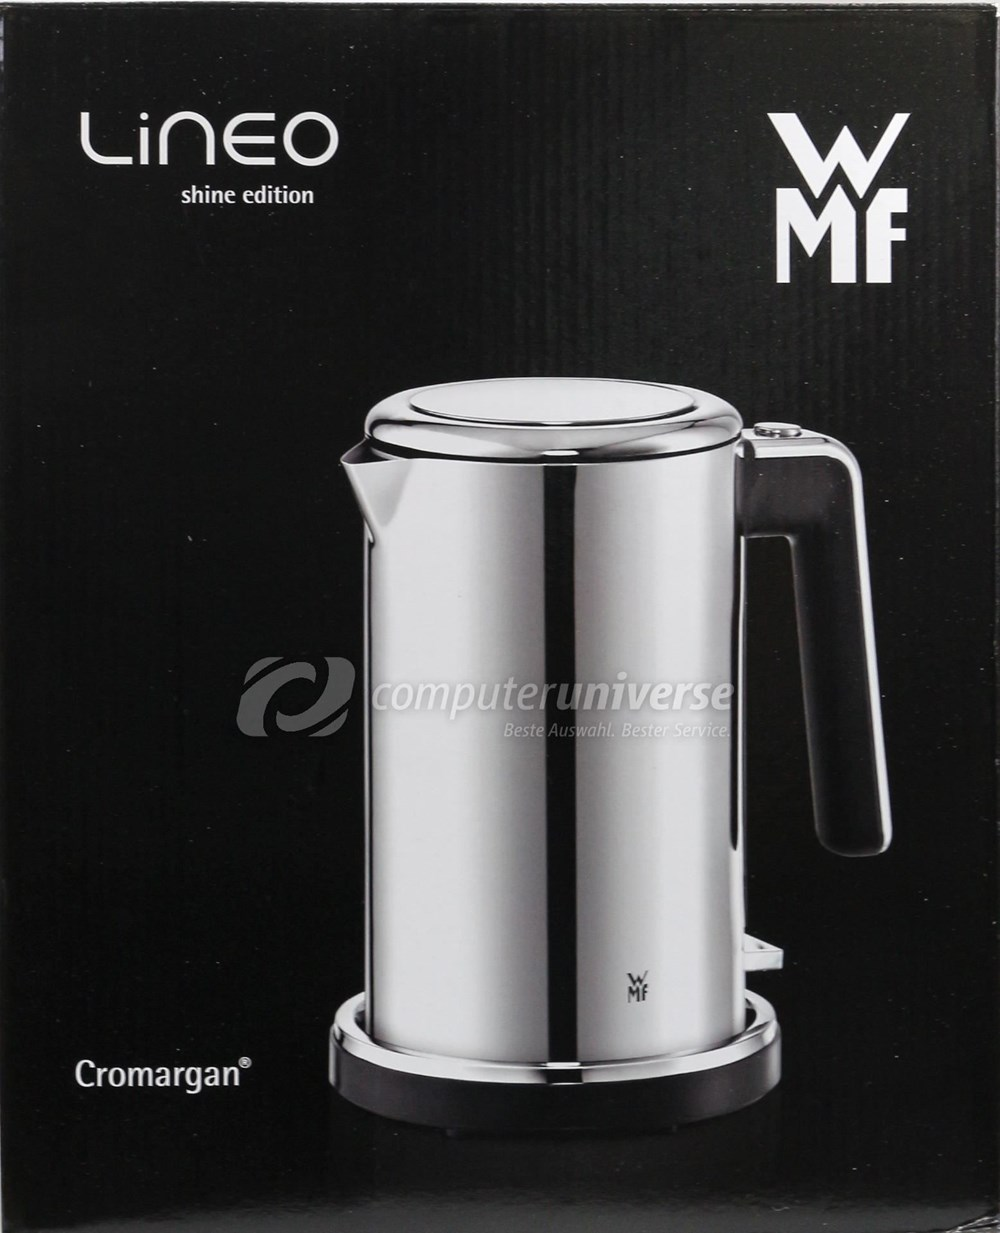 WMF Lineo shine edition 1,6l Wasserkocher edelstahl - Preisvergleich